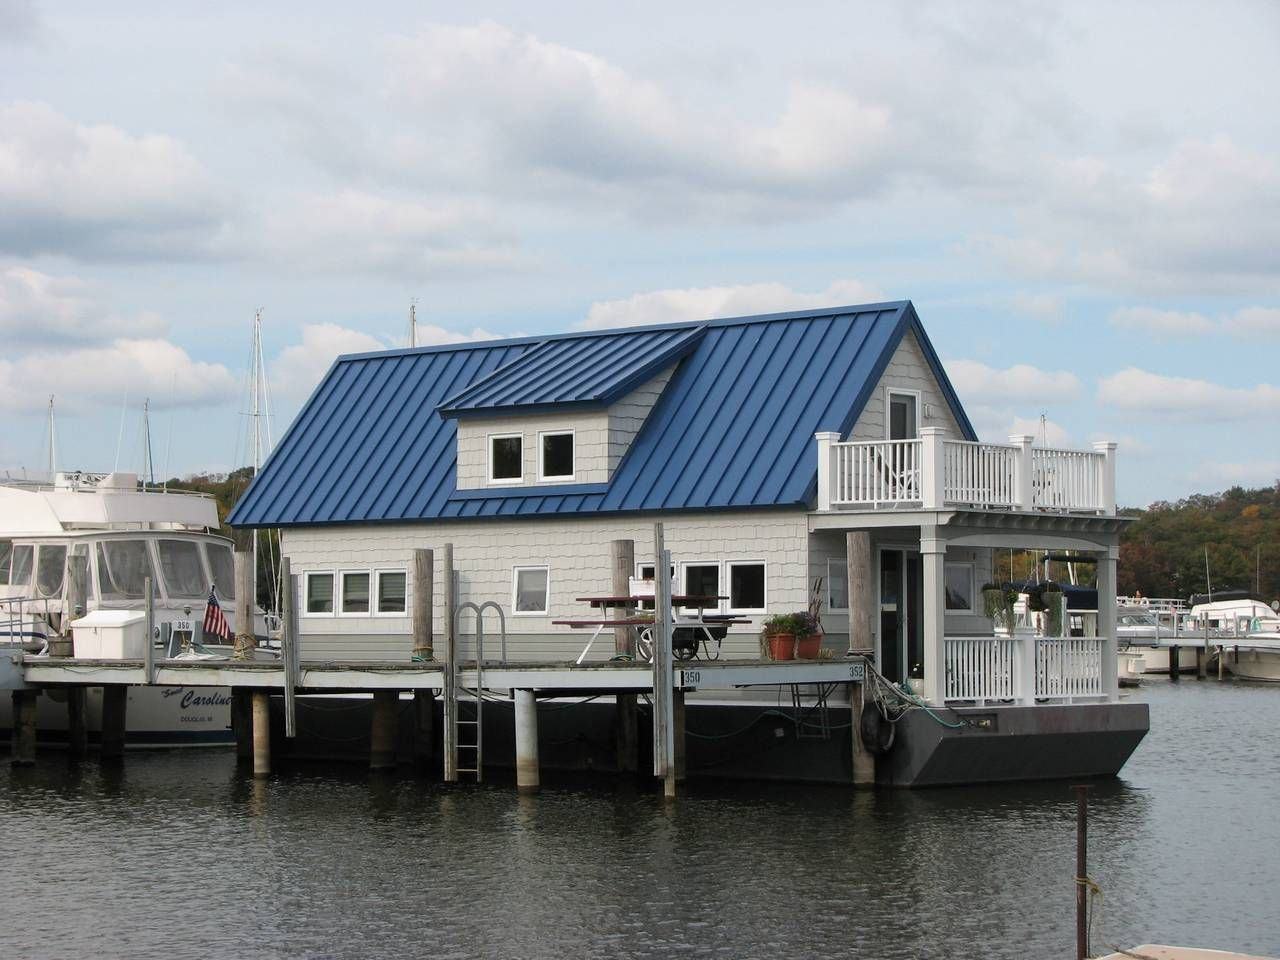 Floating cottage on the beautiful saugatuck harbor boats